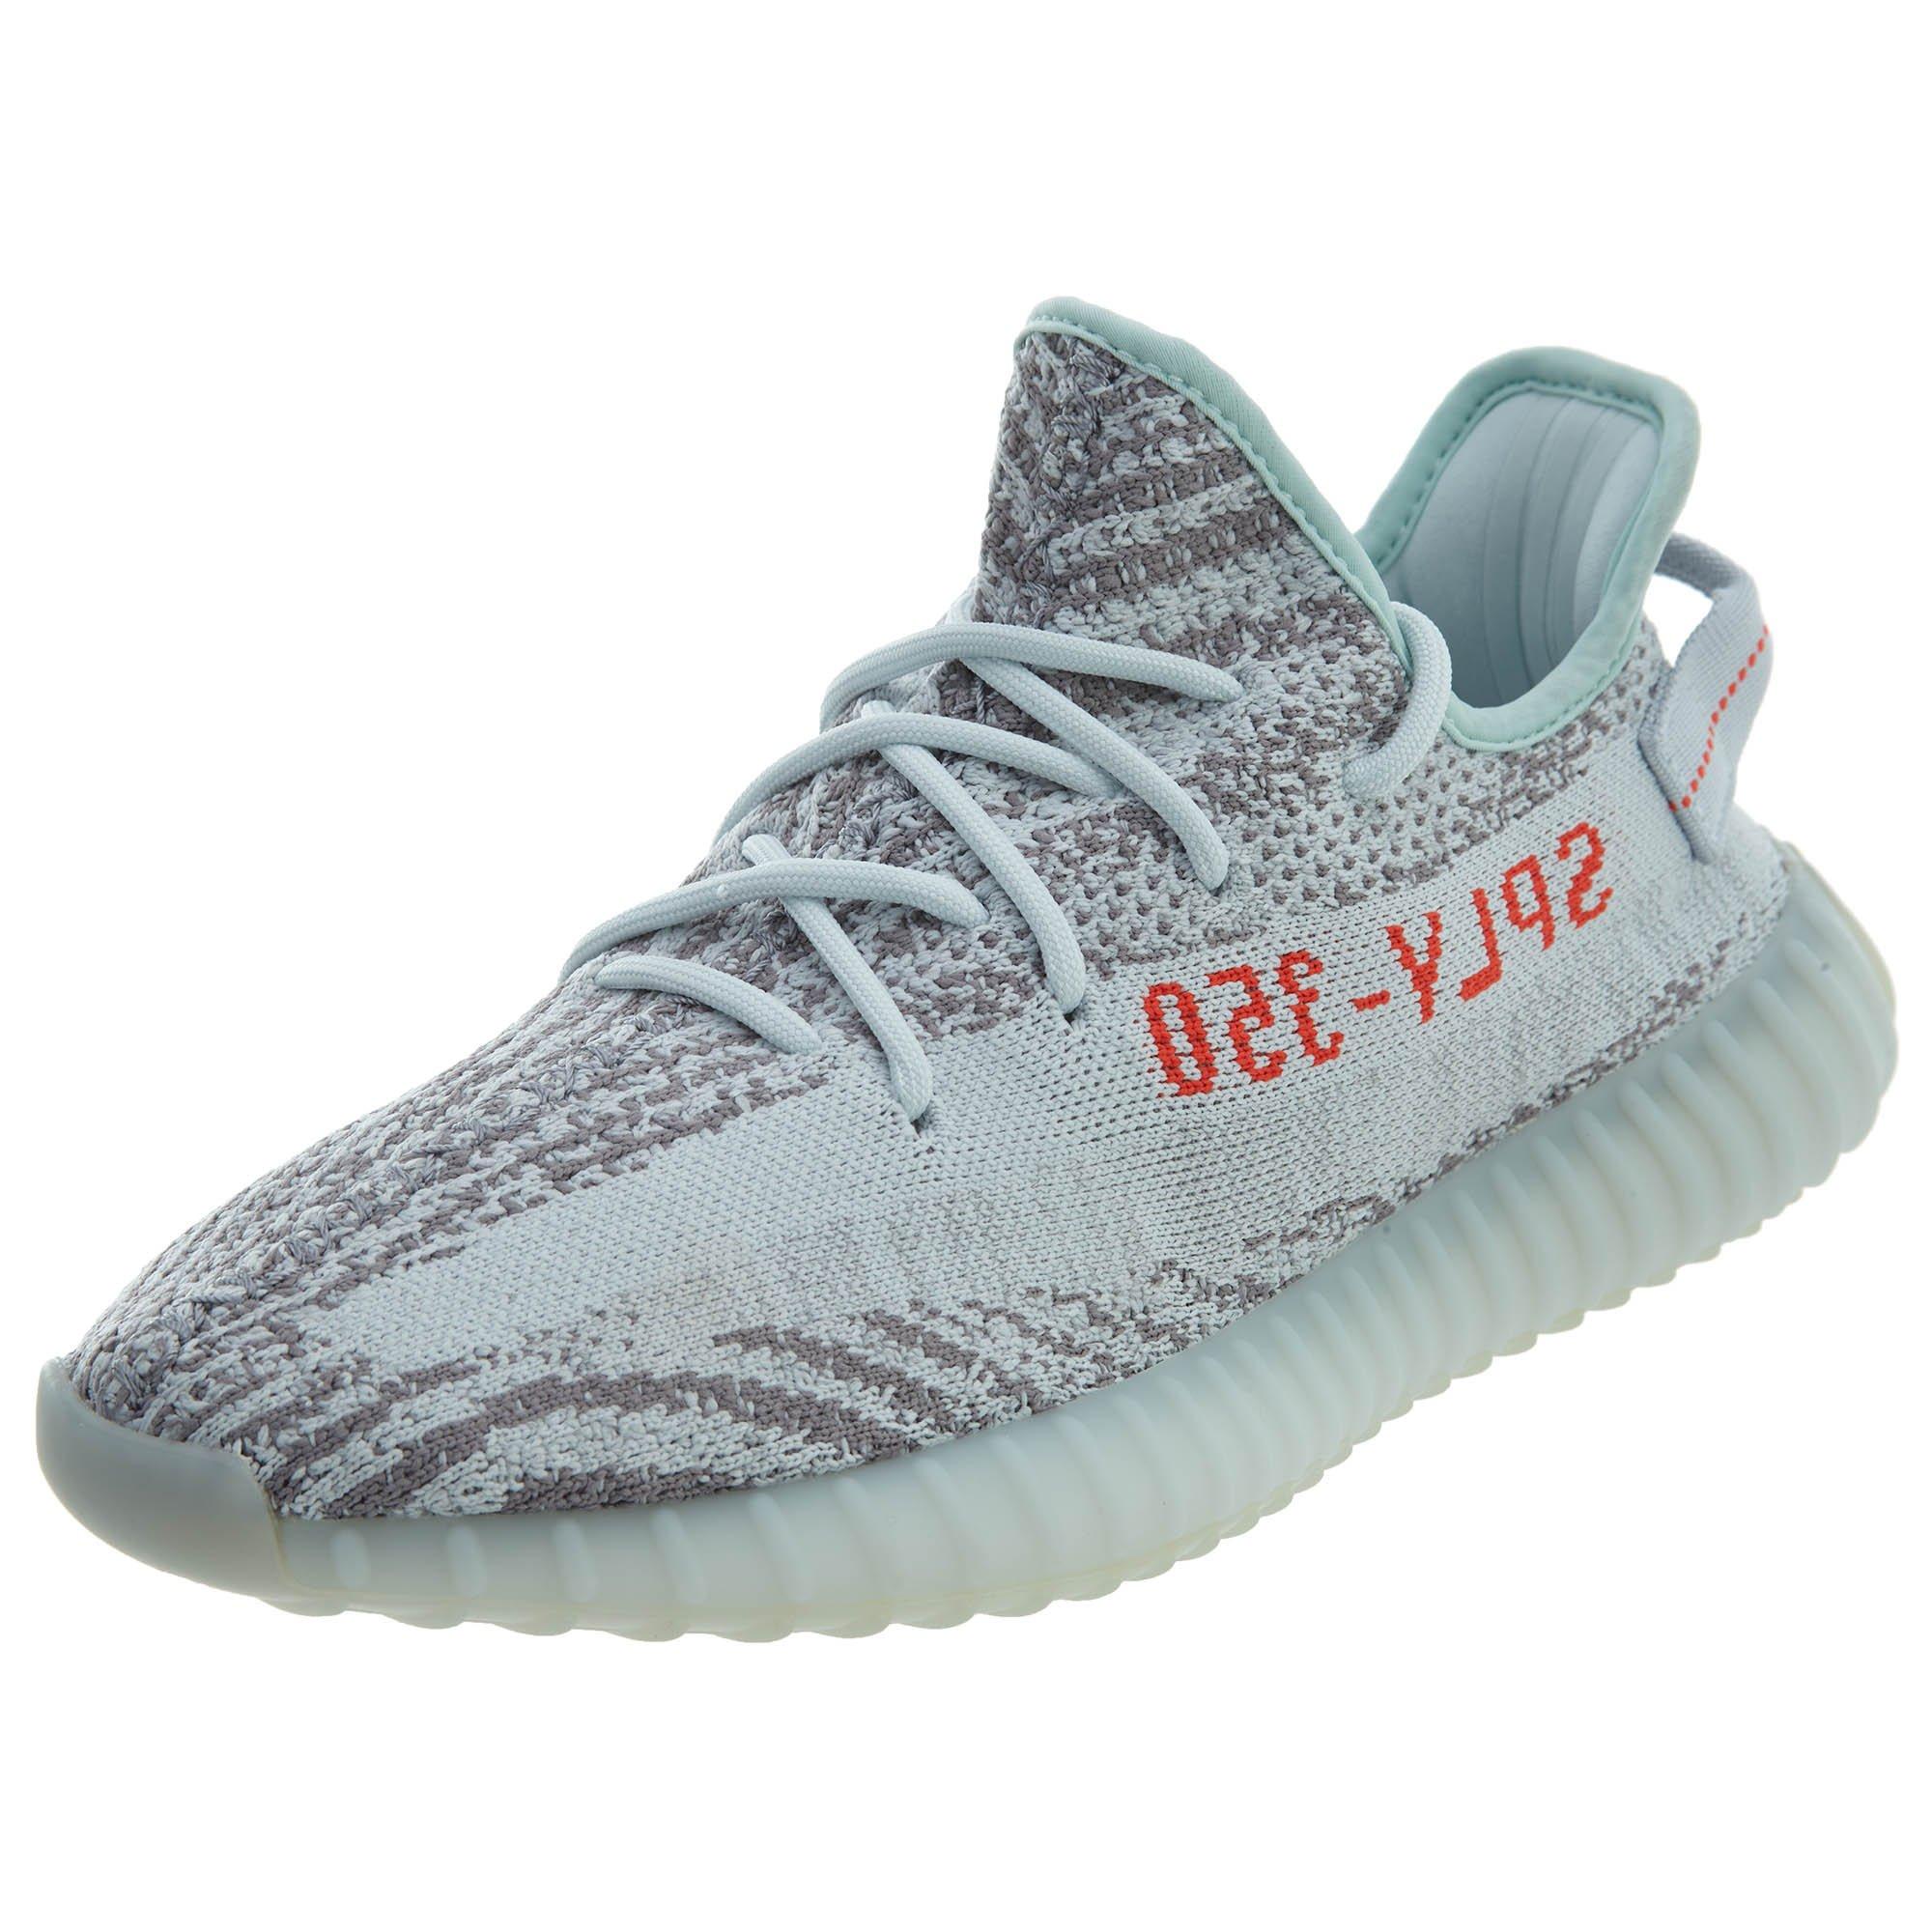 Shop \u003e yeezy 350 $200- Off 66% - tribac